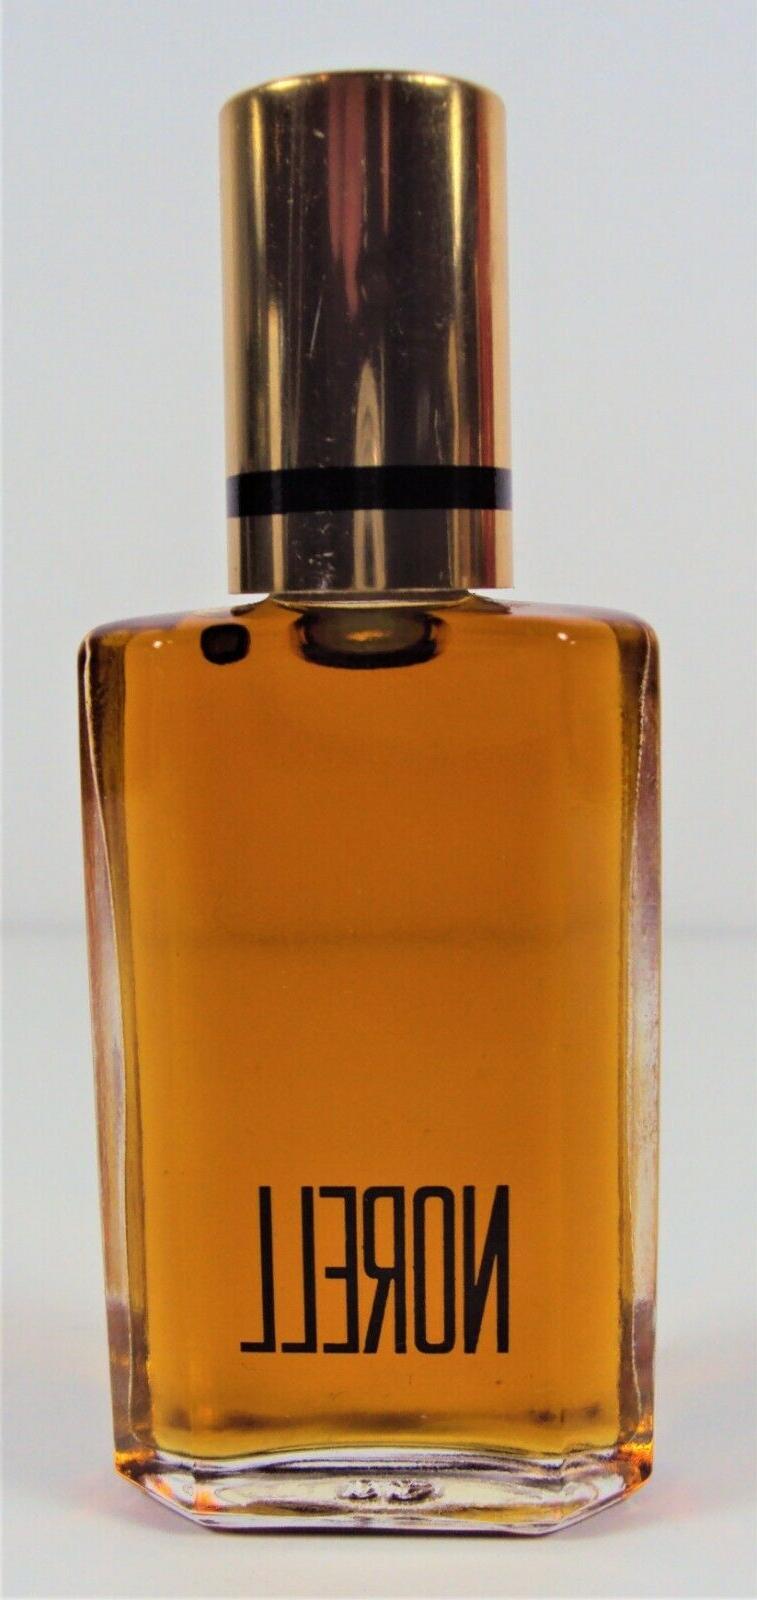 norell parfumed bath oil by fragrances 5